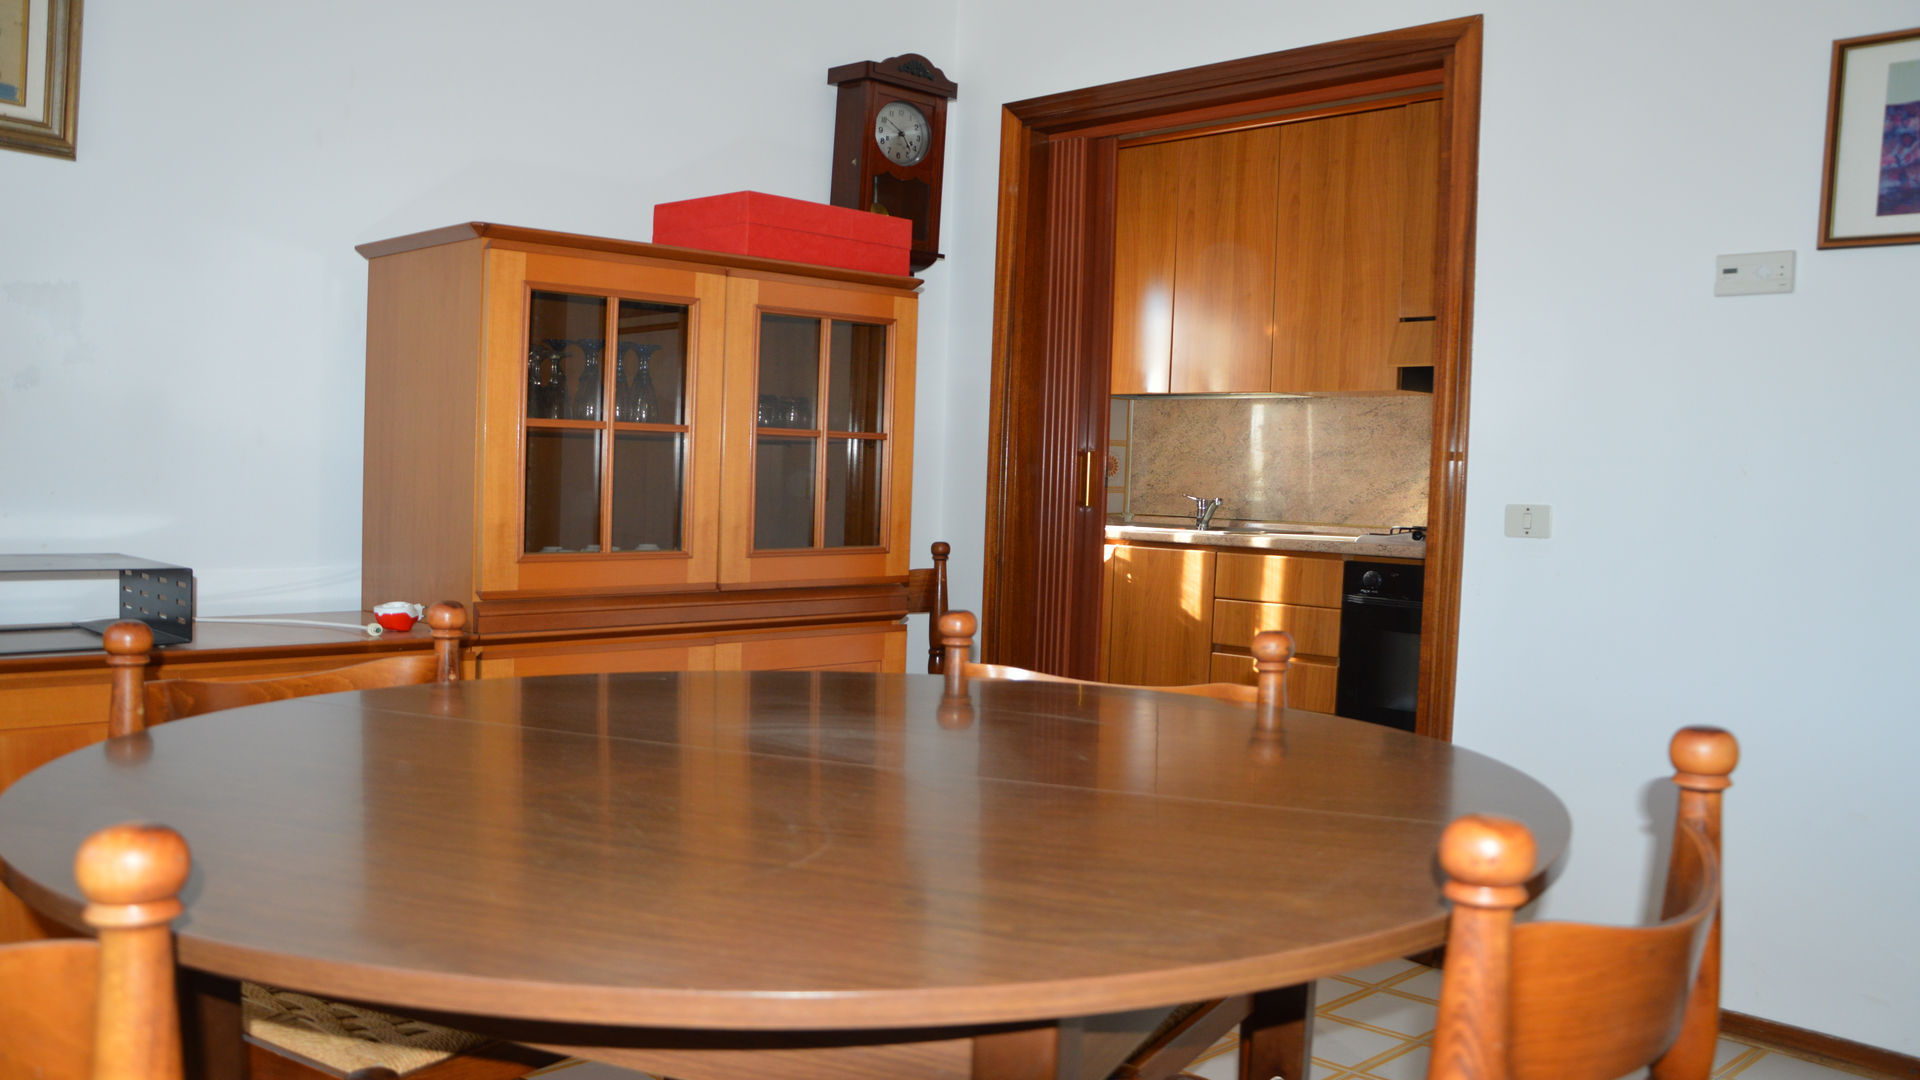 sala da pranzo - Agenzia Viscardi